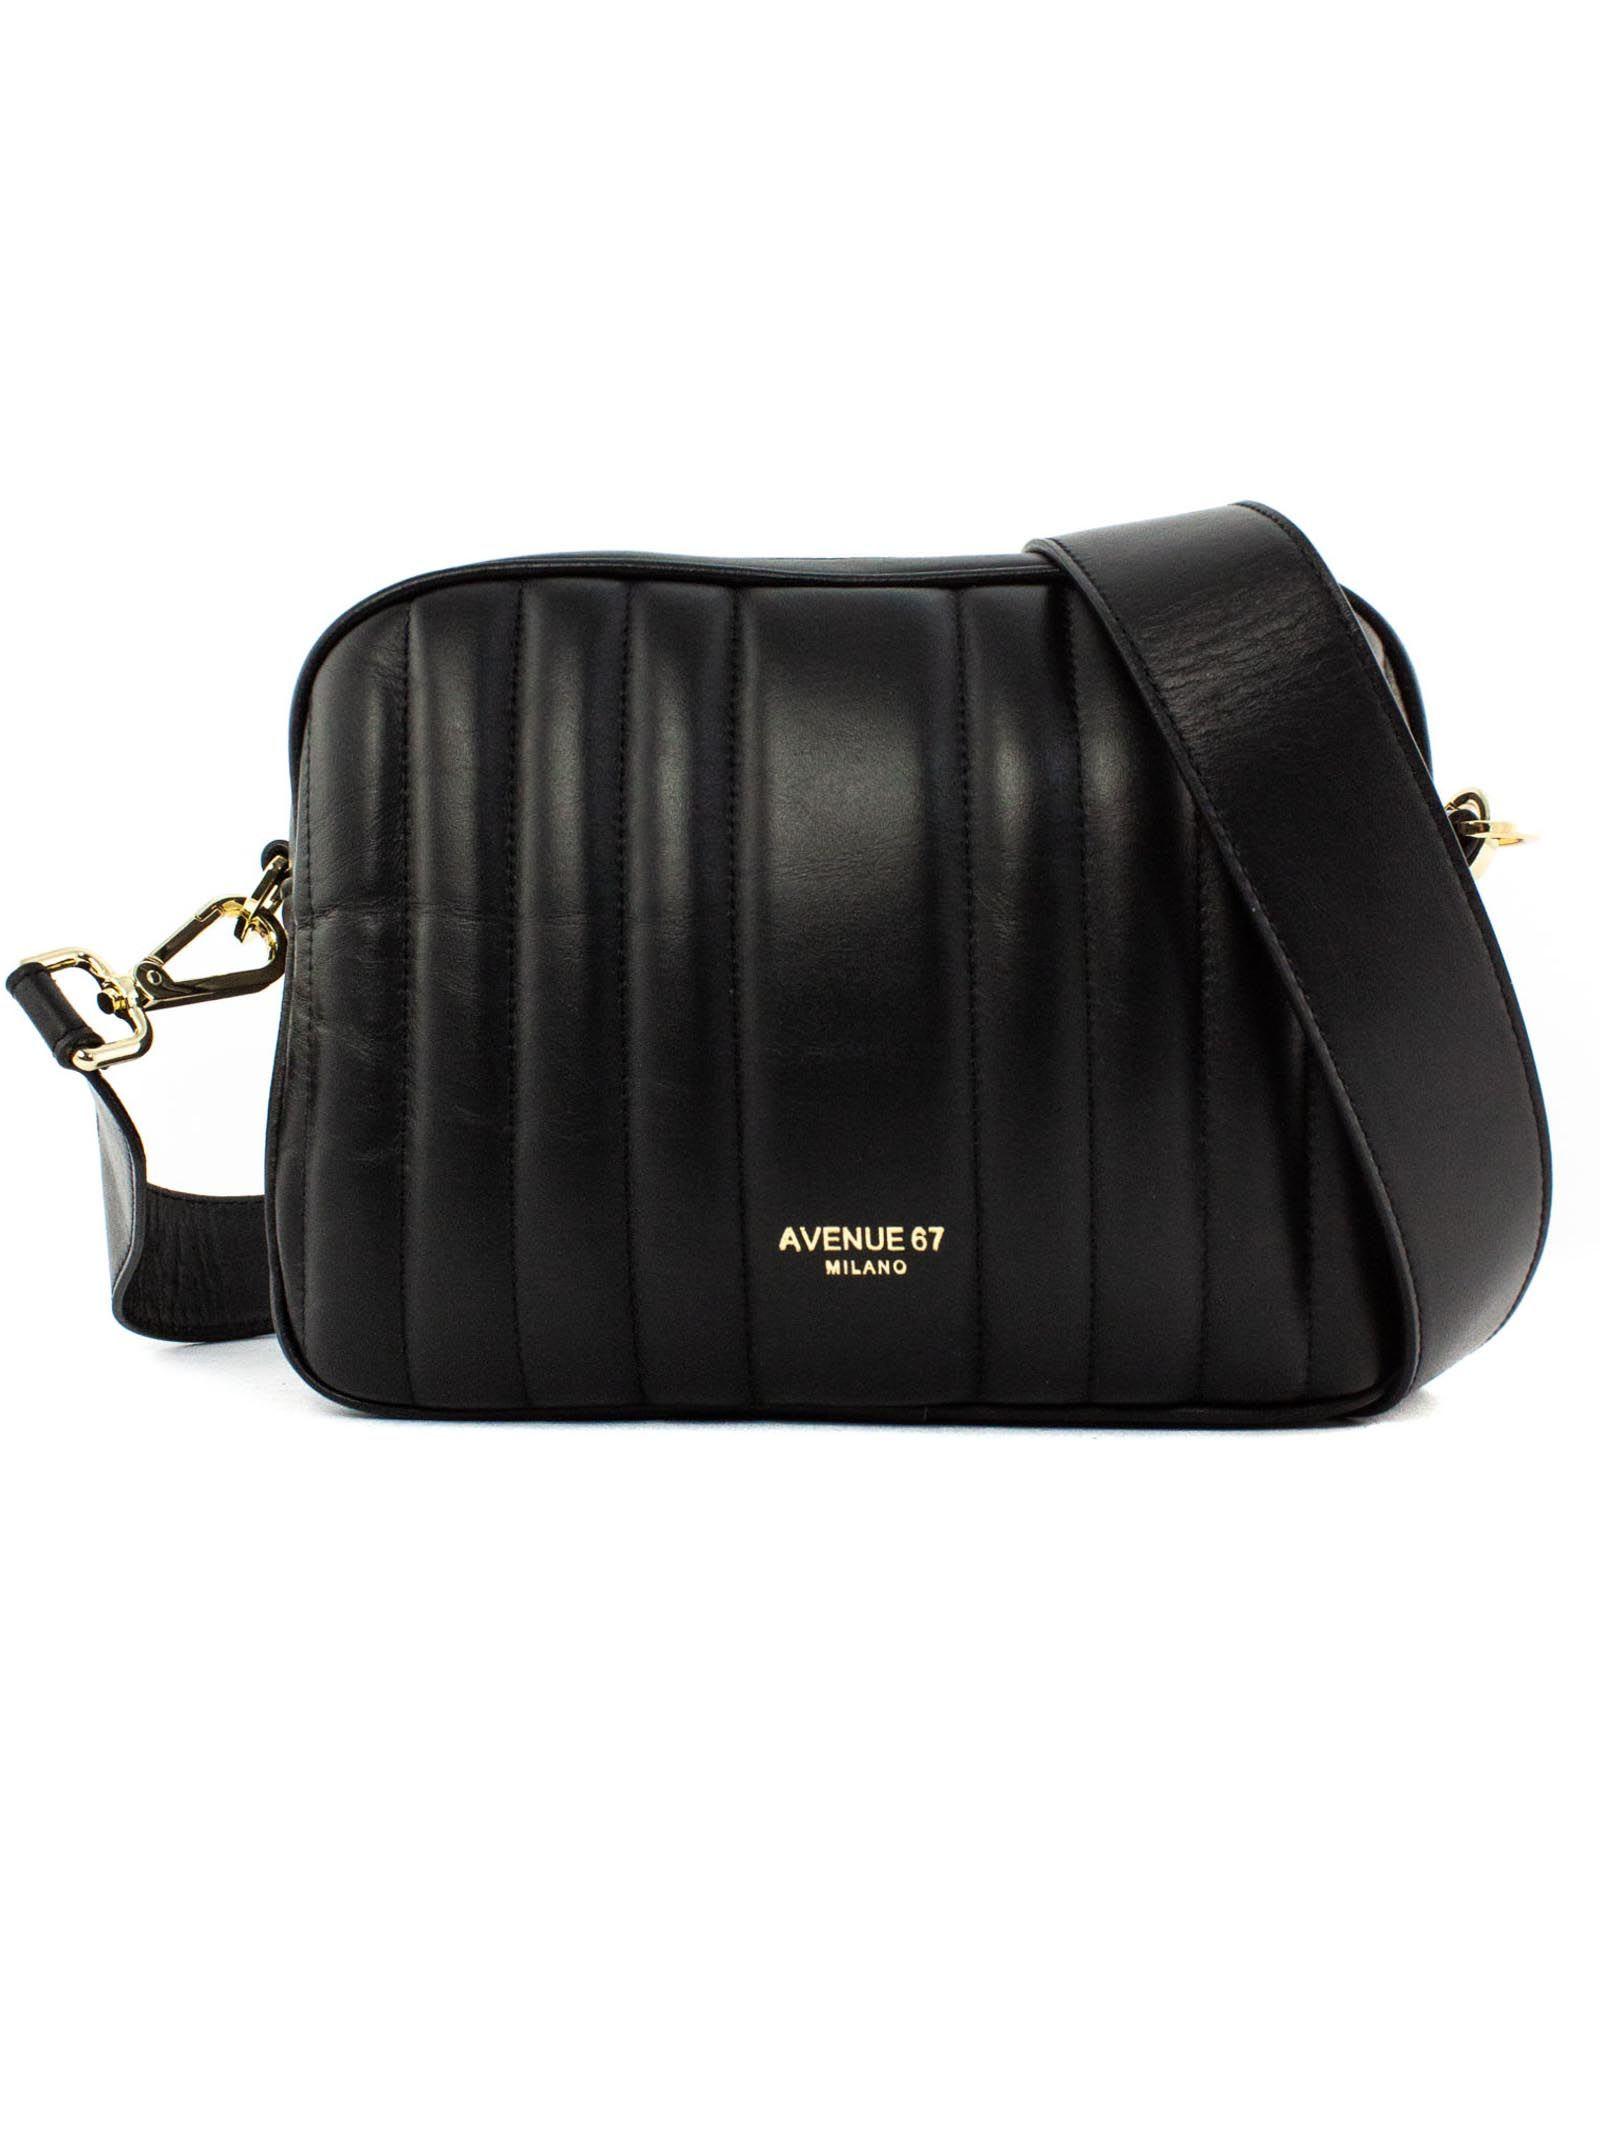 Cloe Small Bag In Black Leather